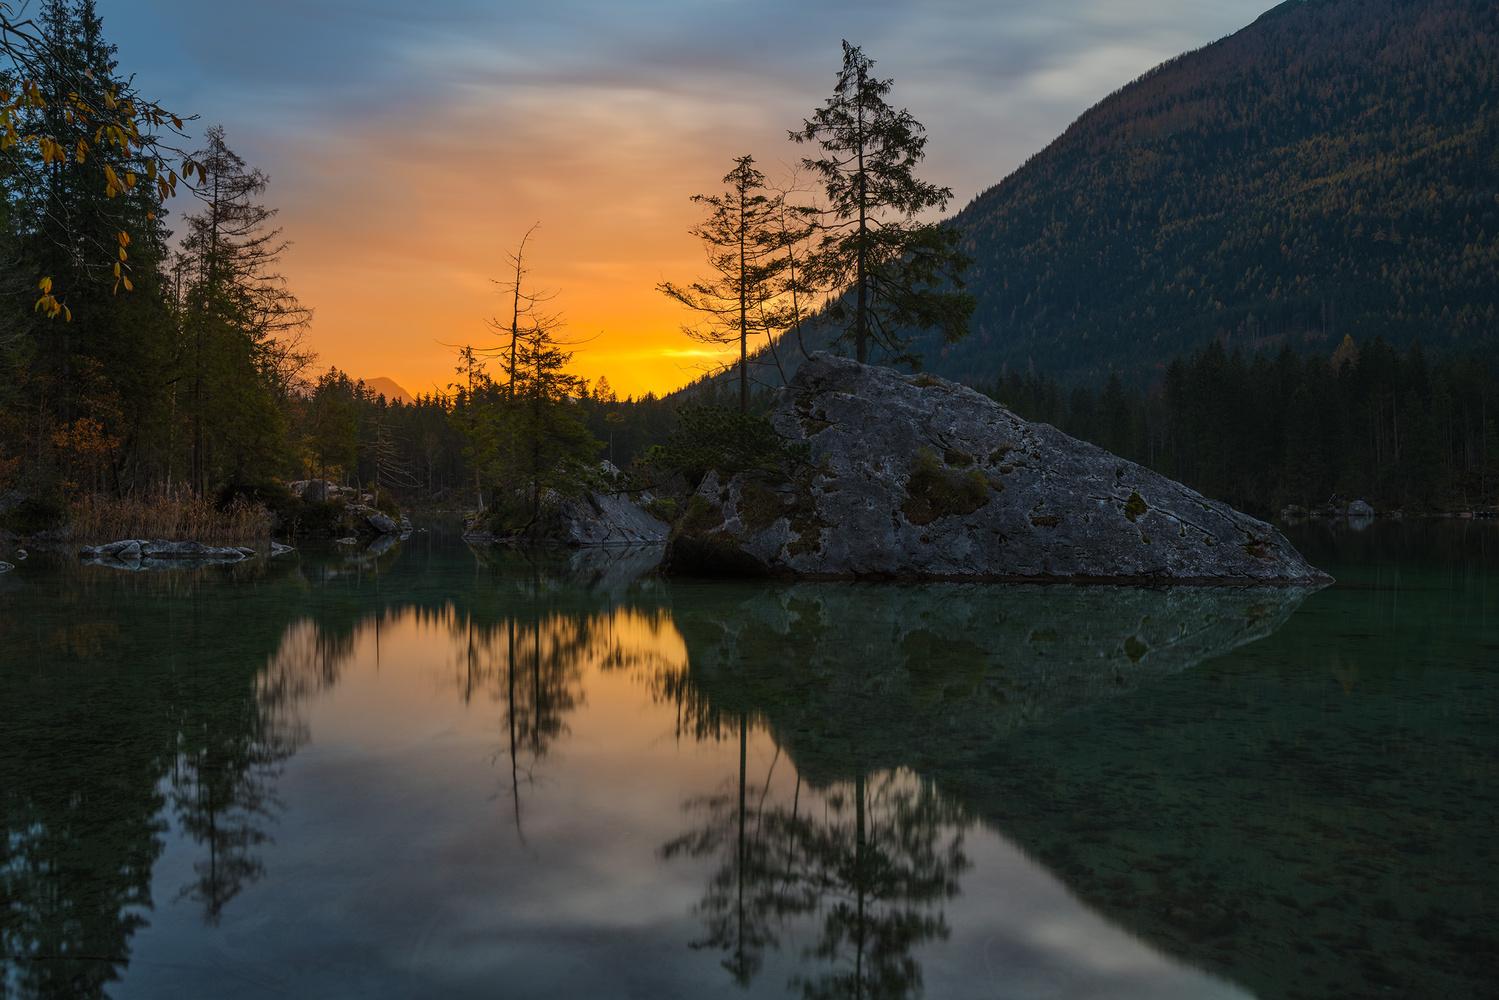 Sunrise over Hintersee by Bruce Neeka